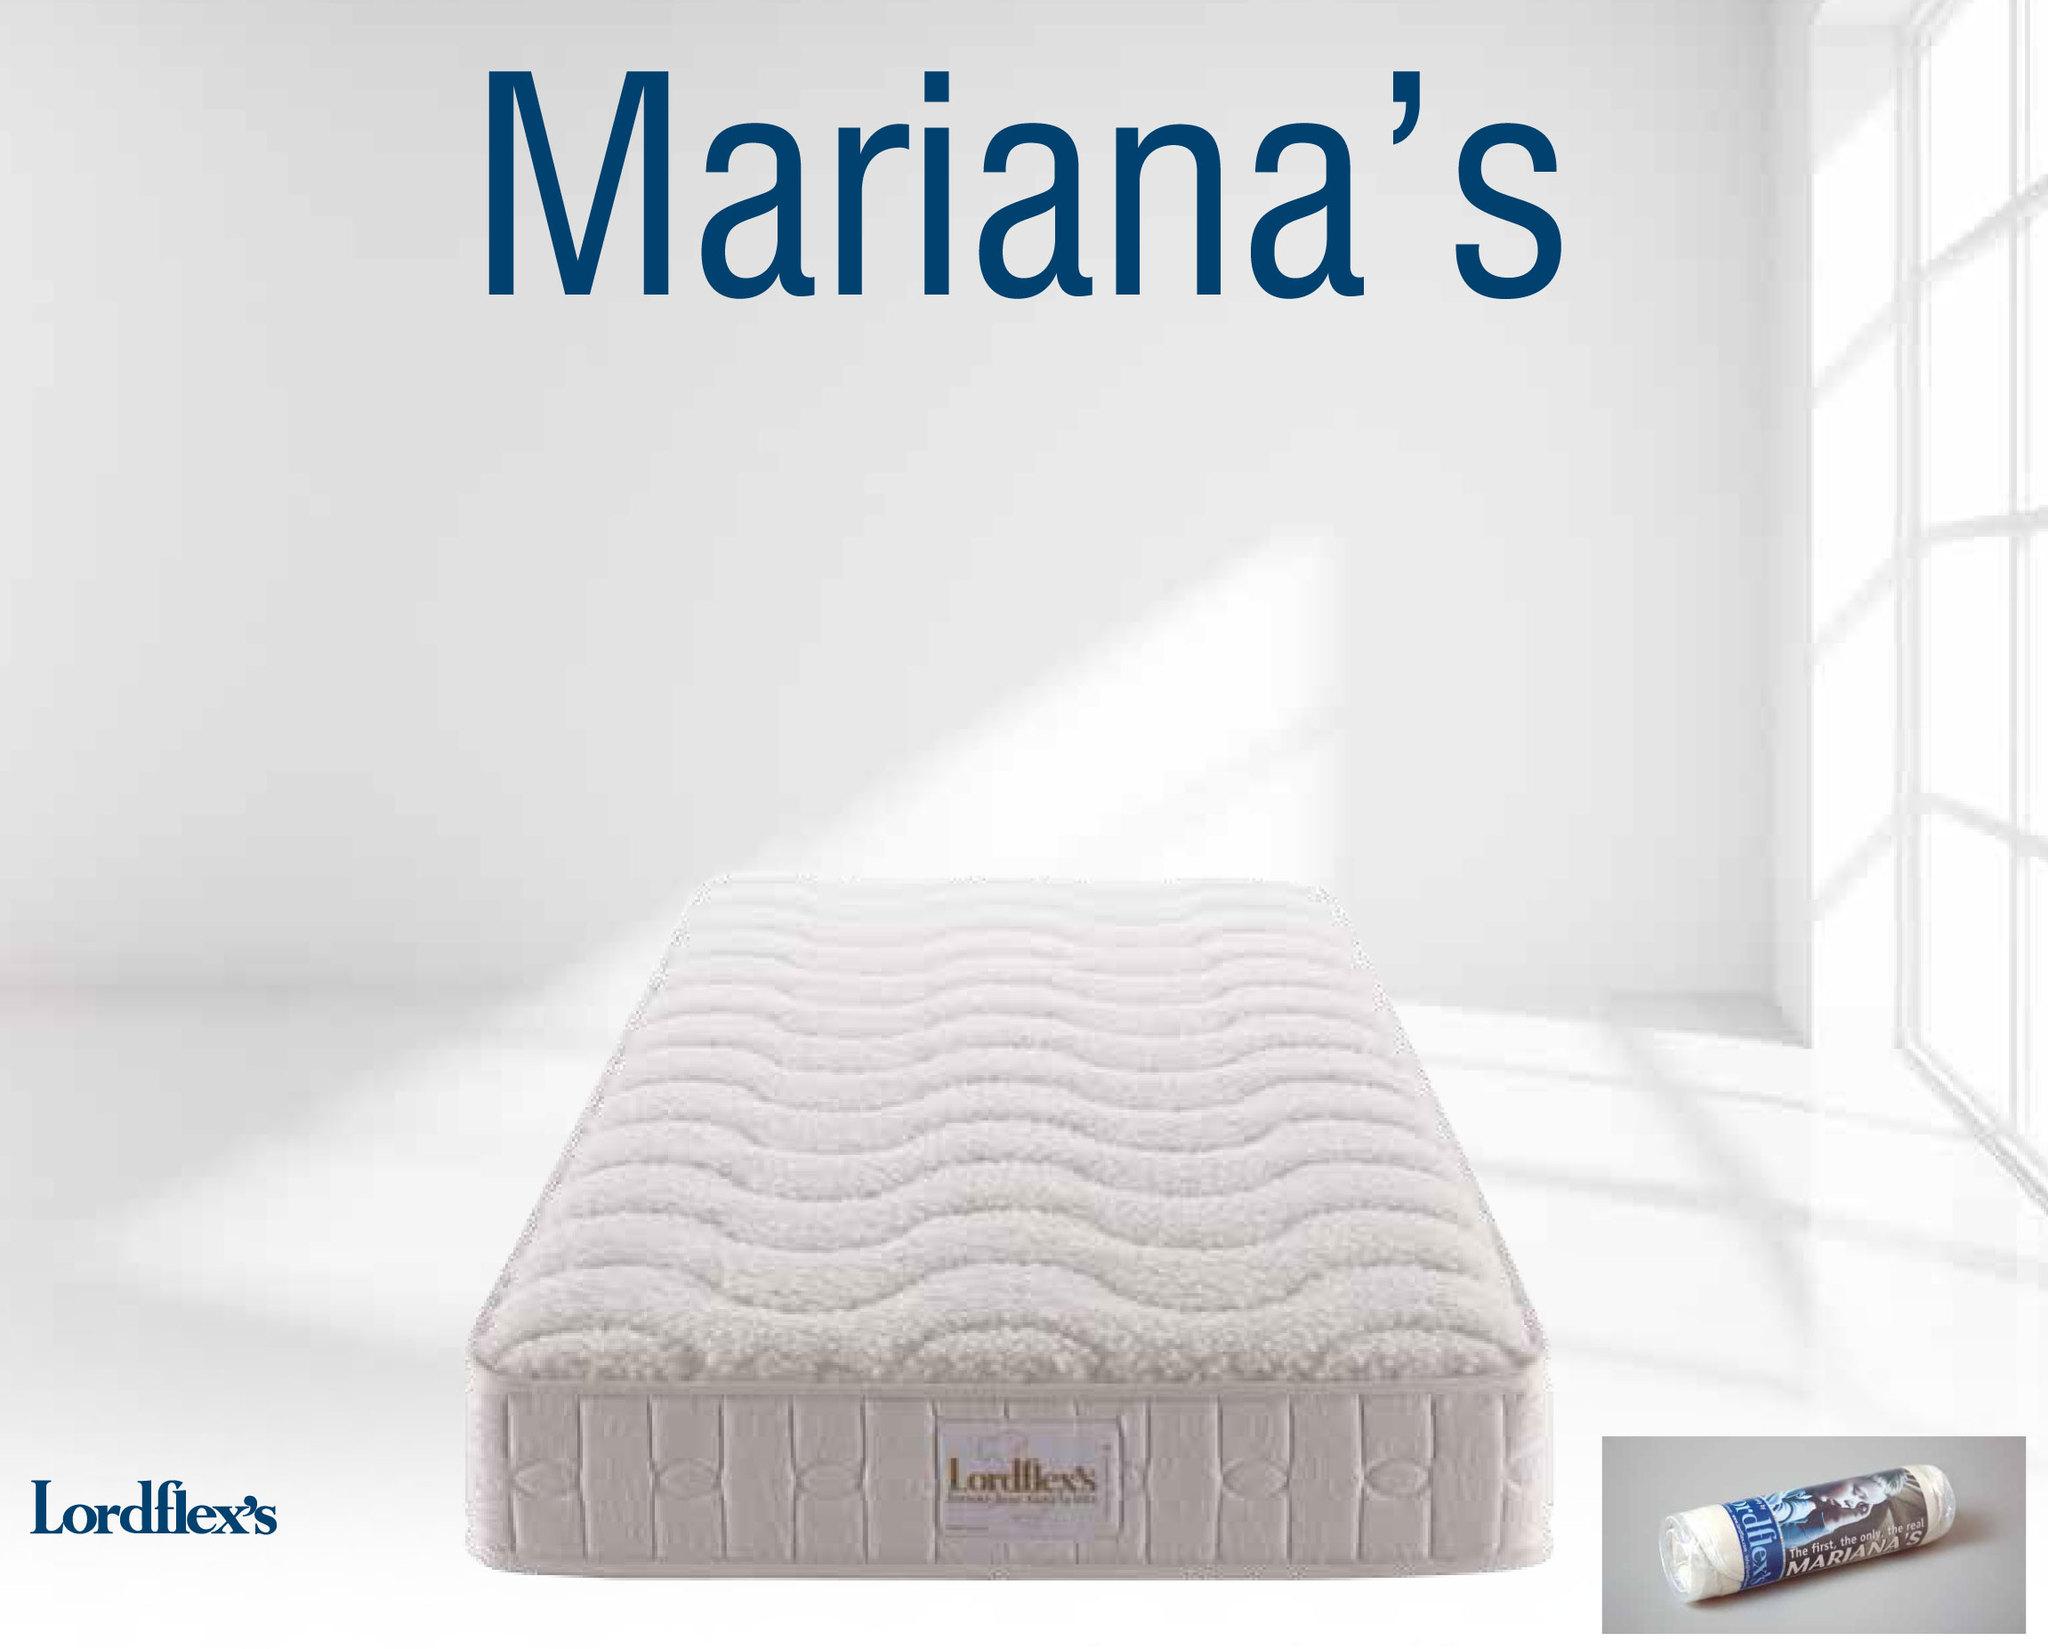 Матрасы Матрас ортопедический Lordflex's Mariana's 60х125 до 140 кг 1_Mariana_s.jpg